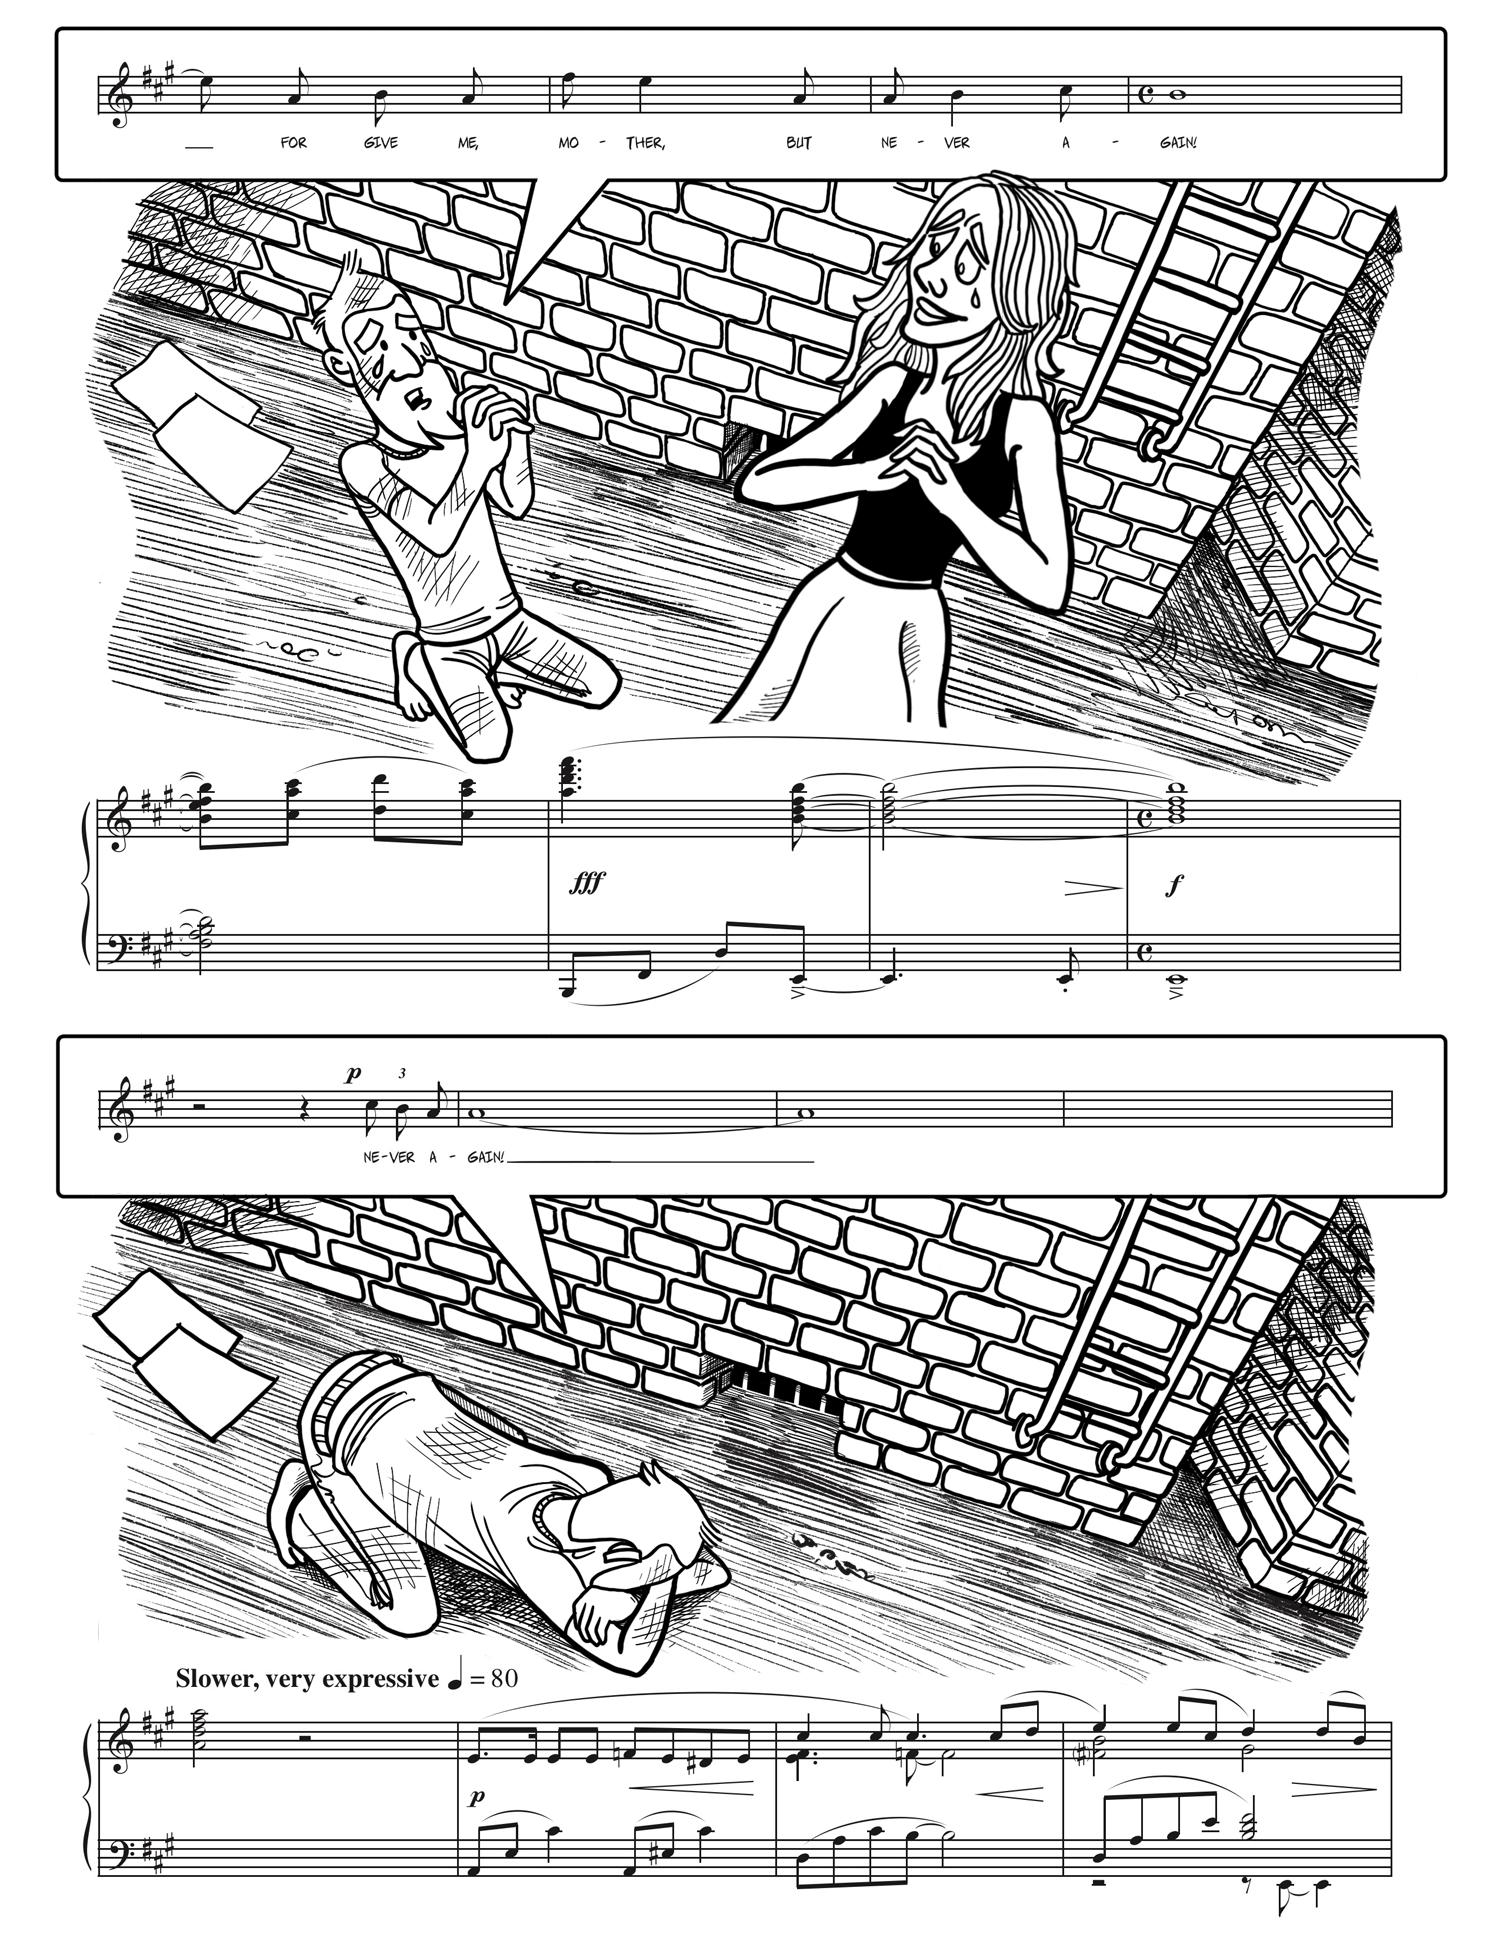 PAGE-251.jpg